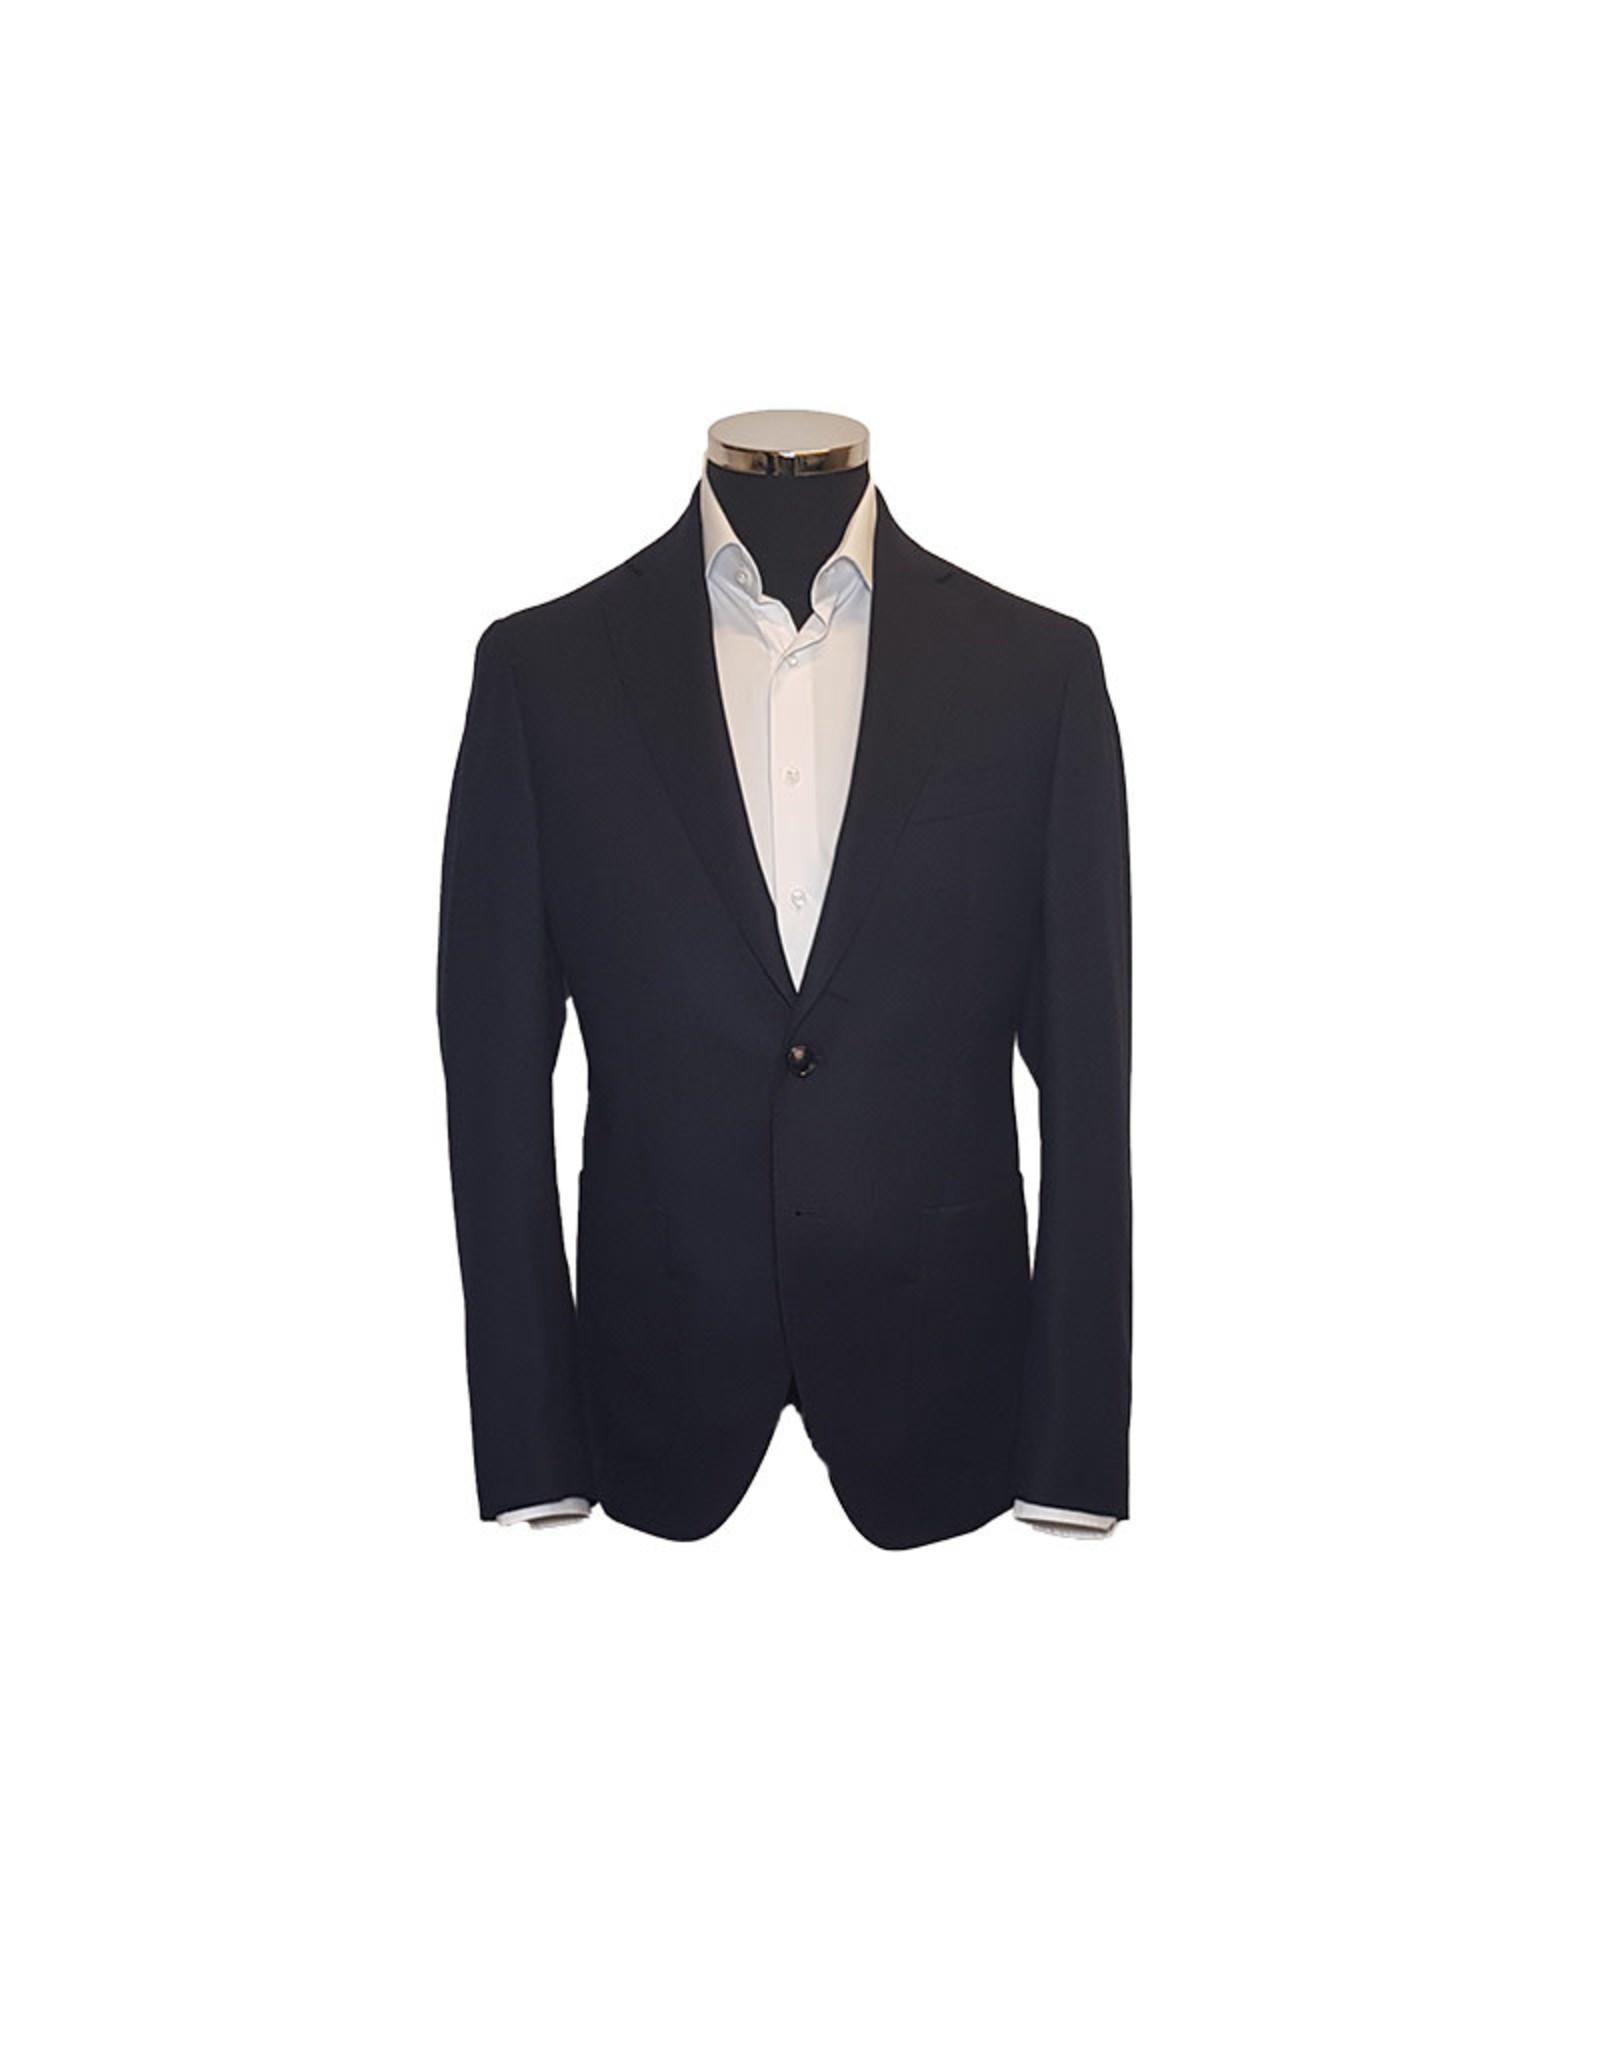 Latorre Gabiati vest blauw Tropez U00021